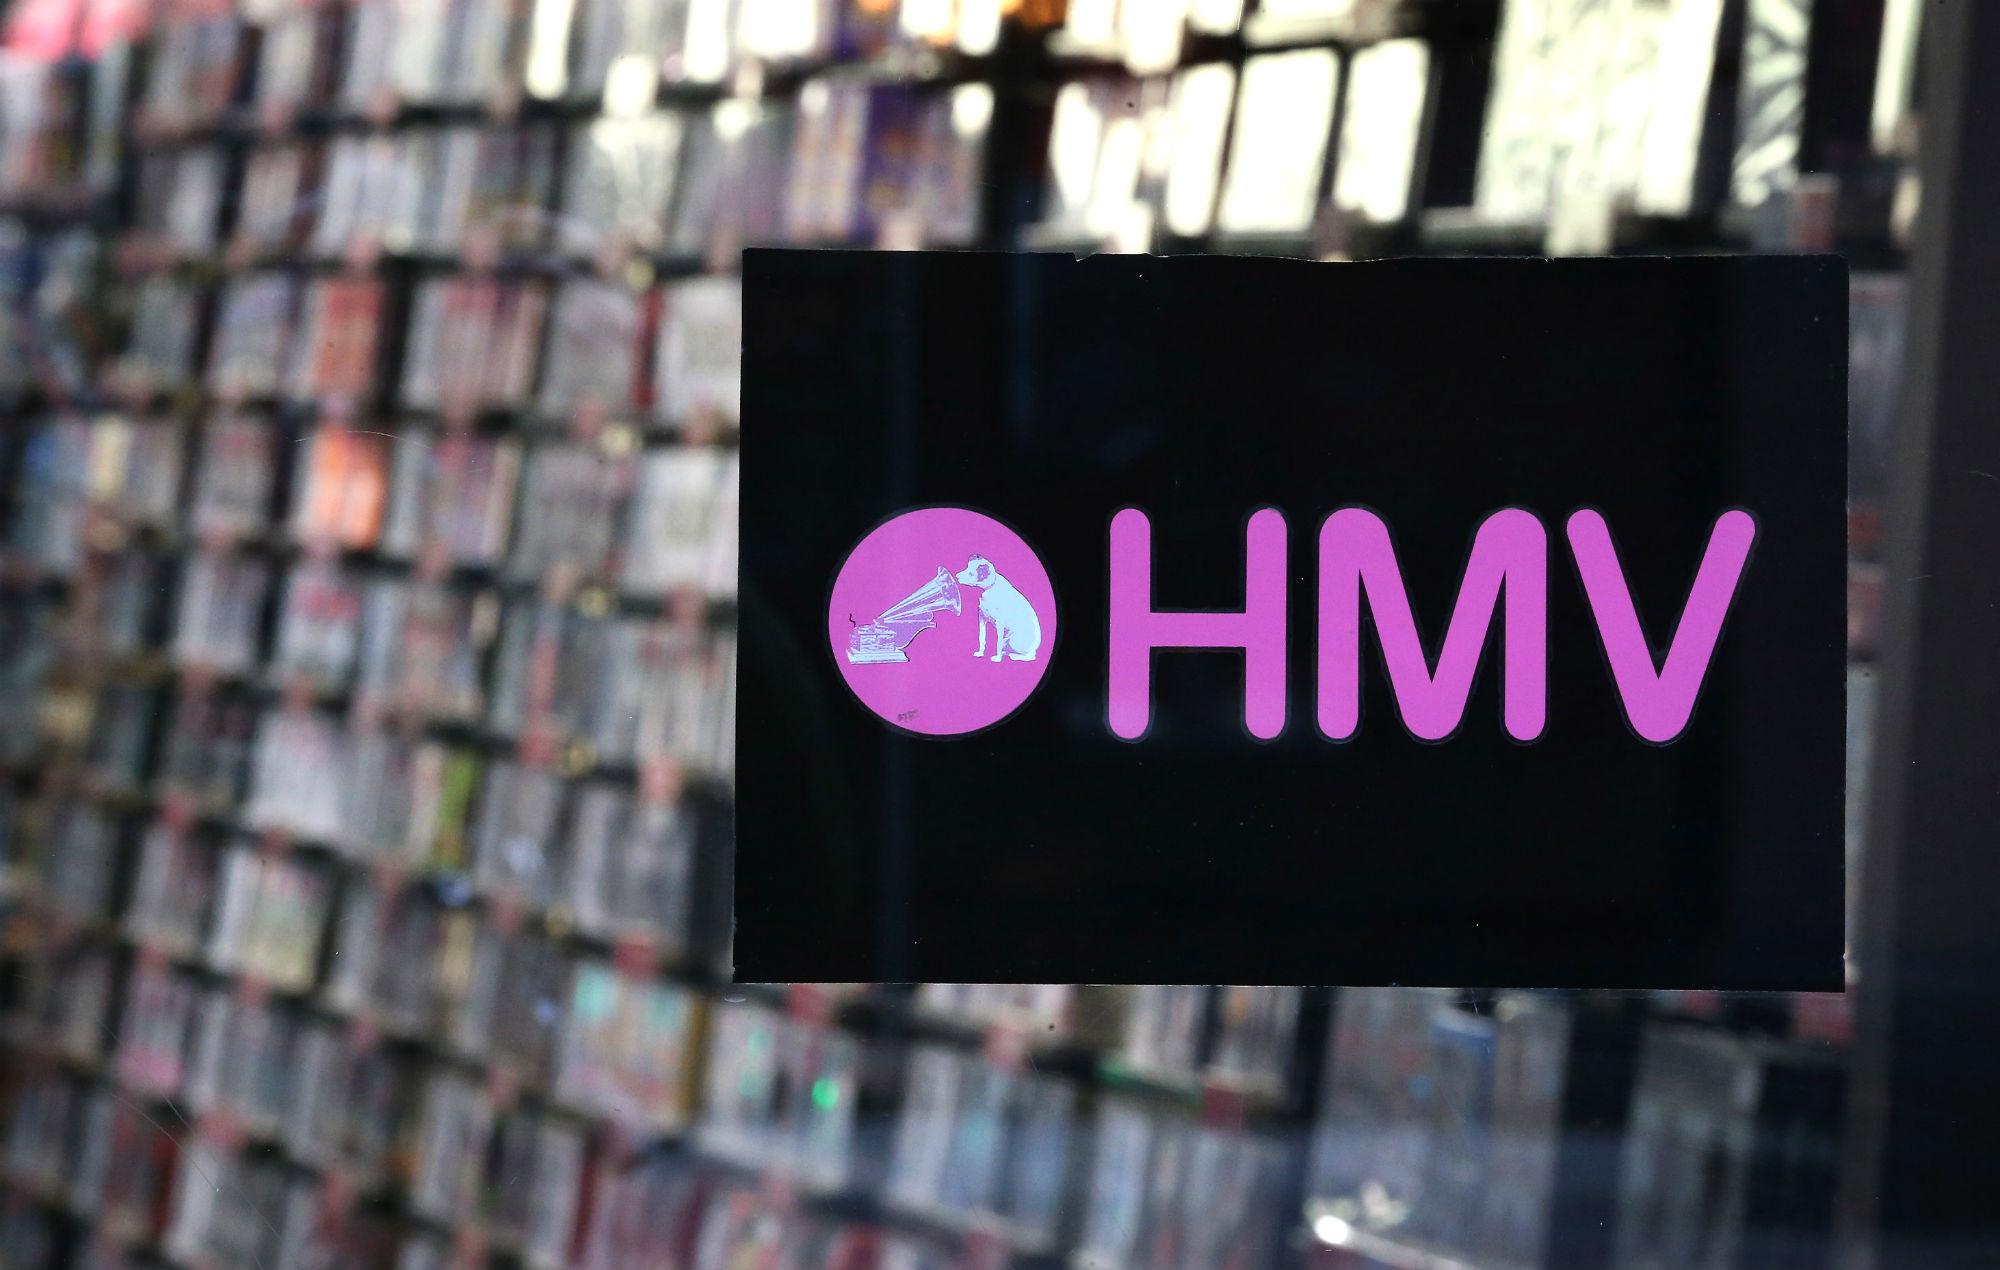 HMV saved 100 stores